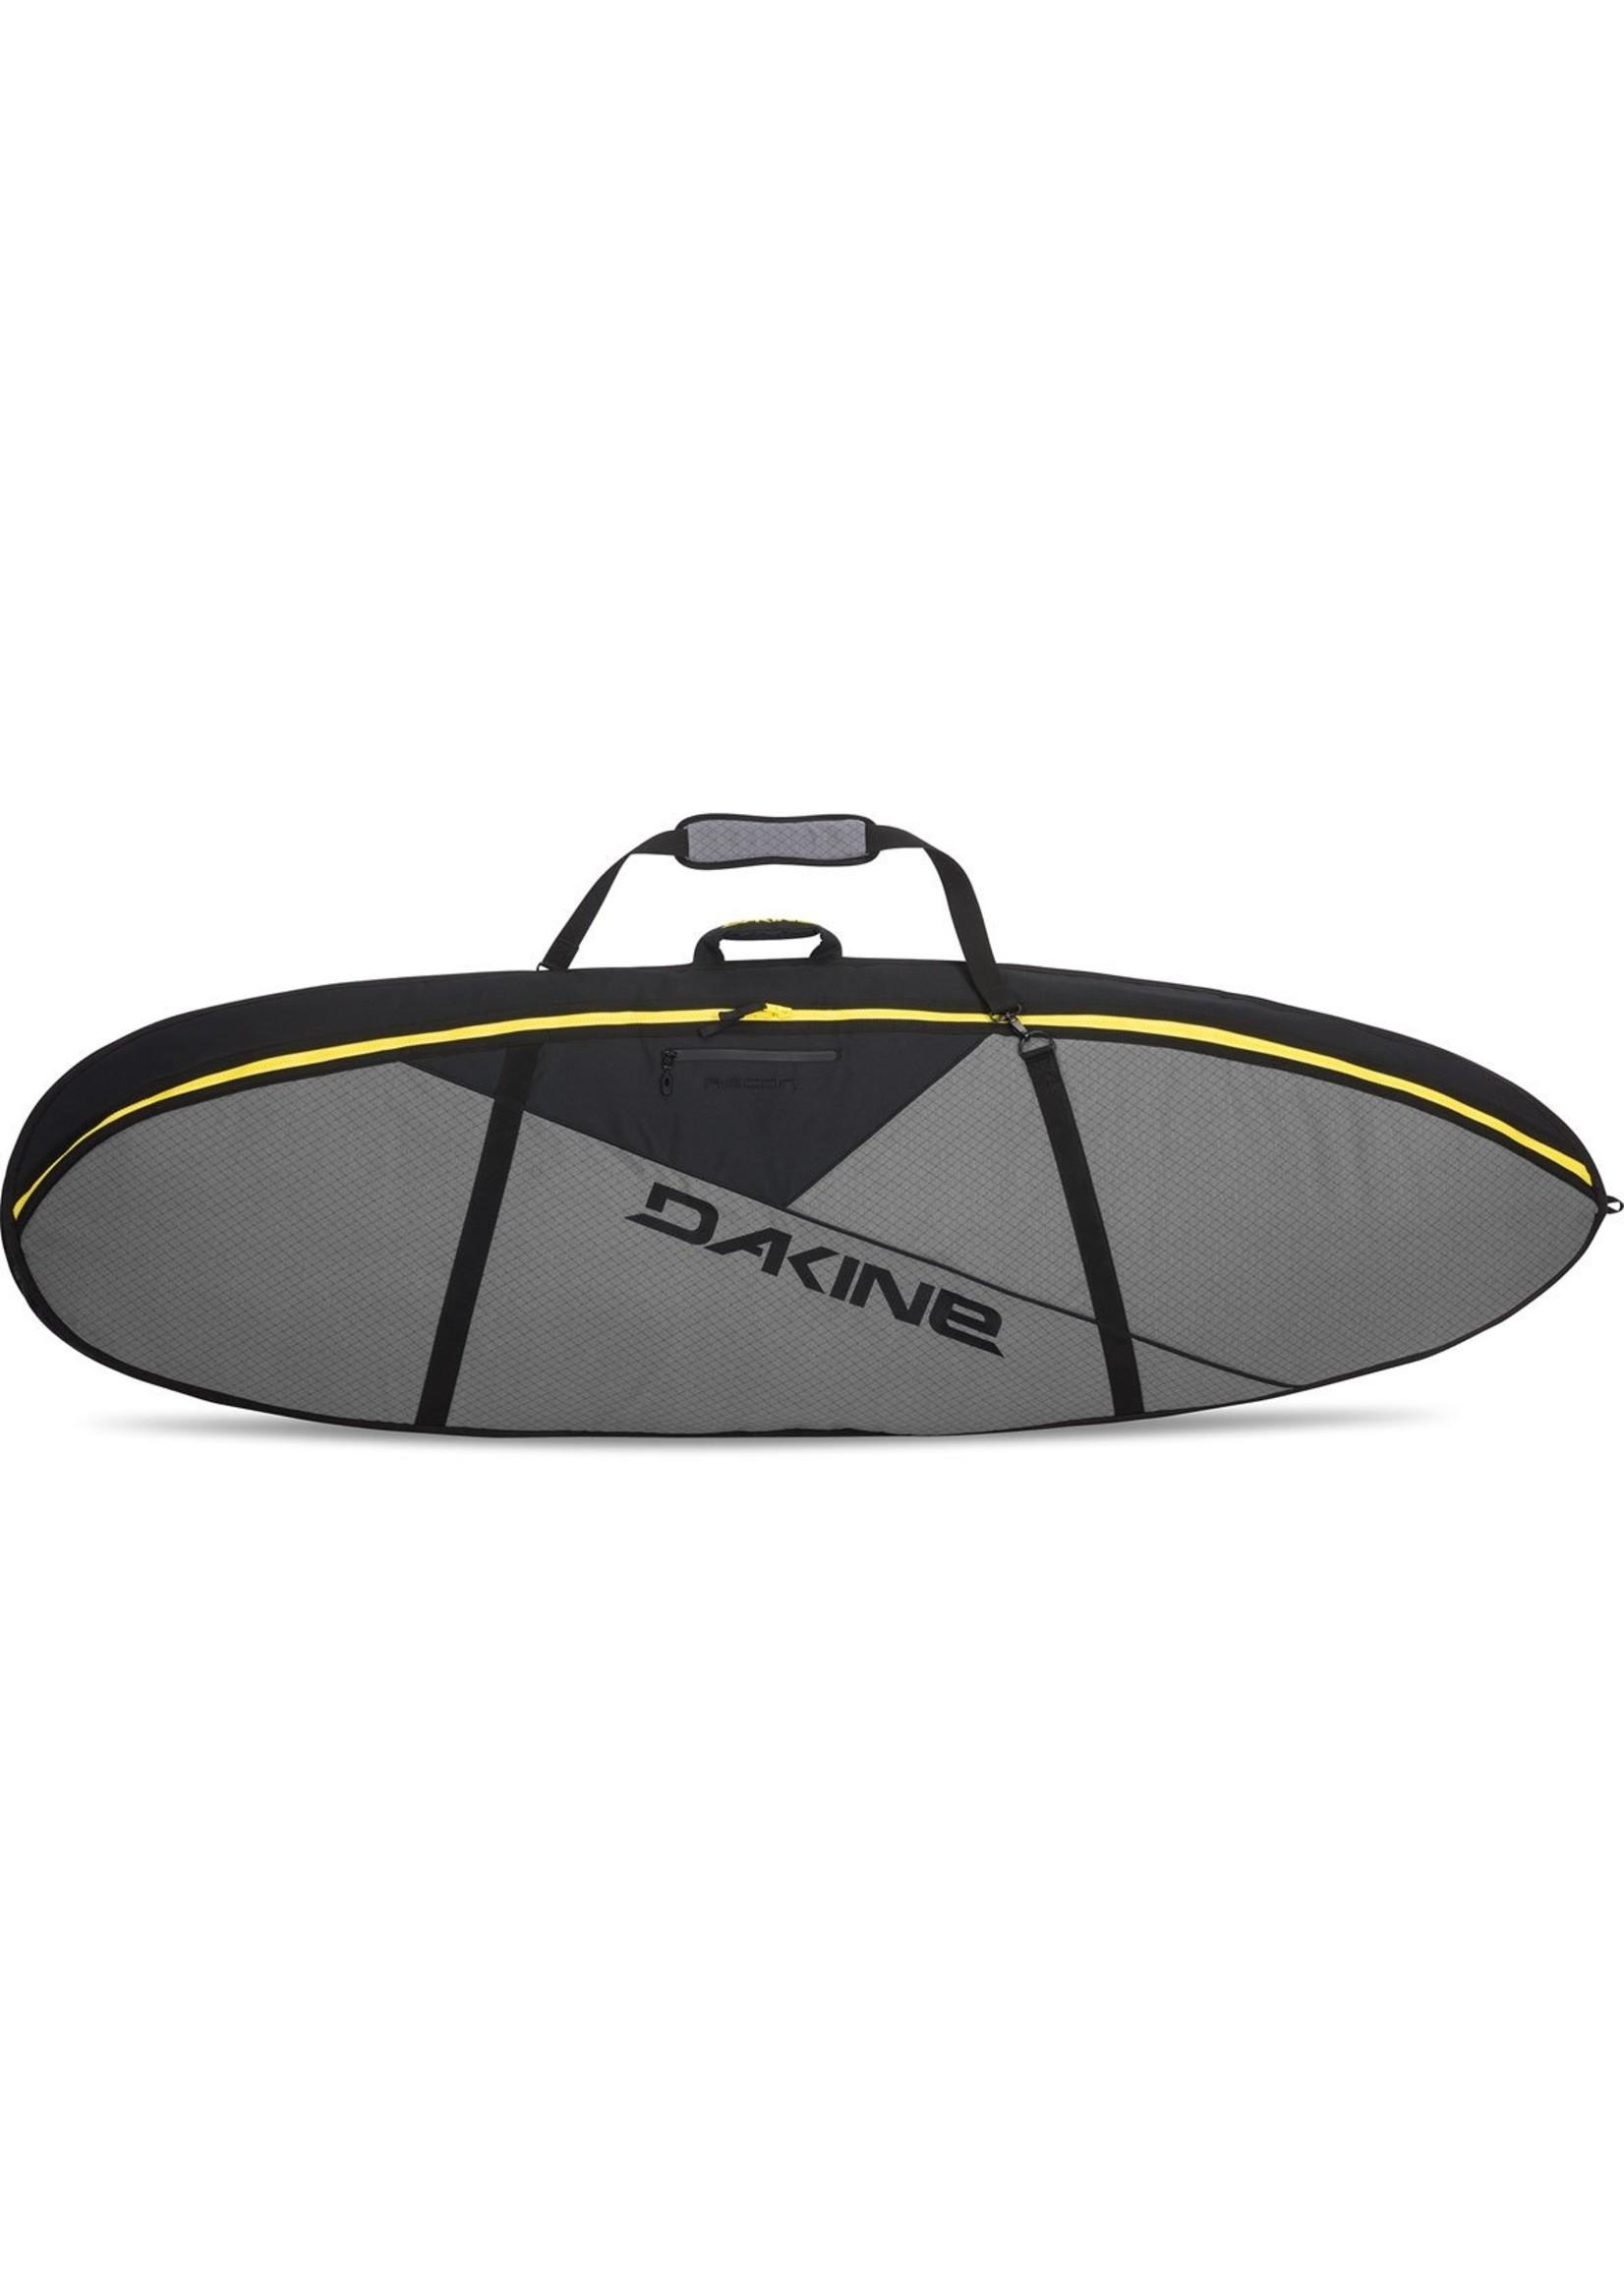 Dakine RECON DOUBLE SURFBOARD BAG - THRUSTER 6'3''